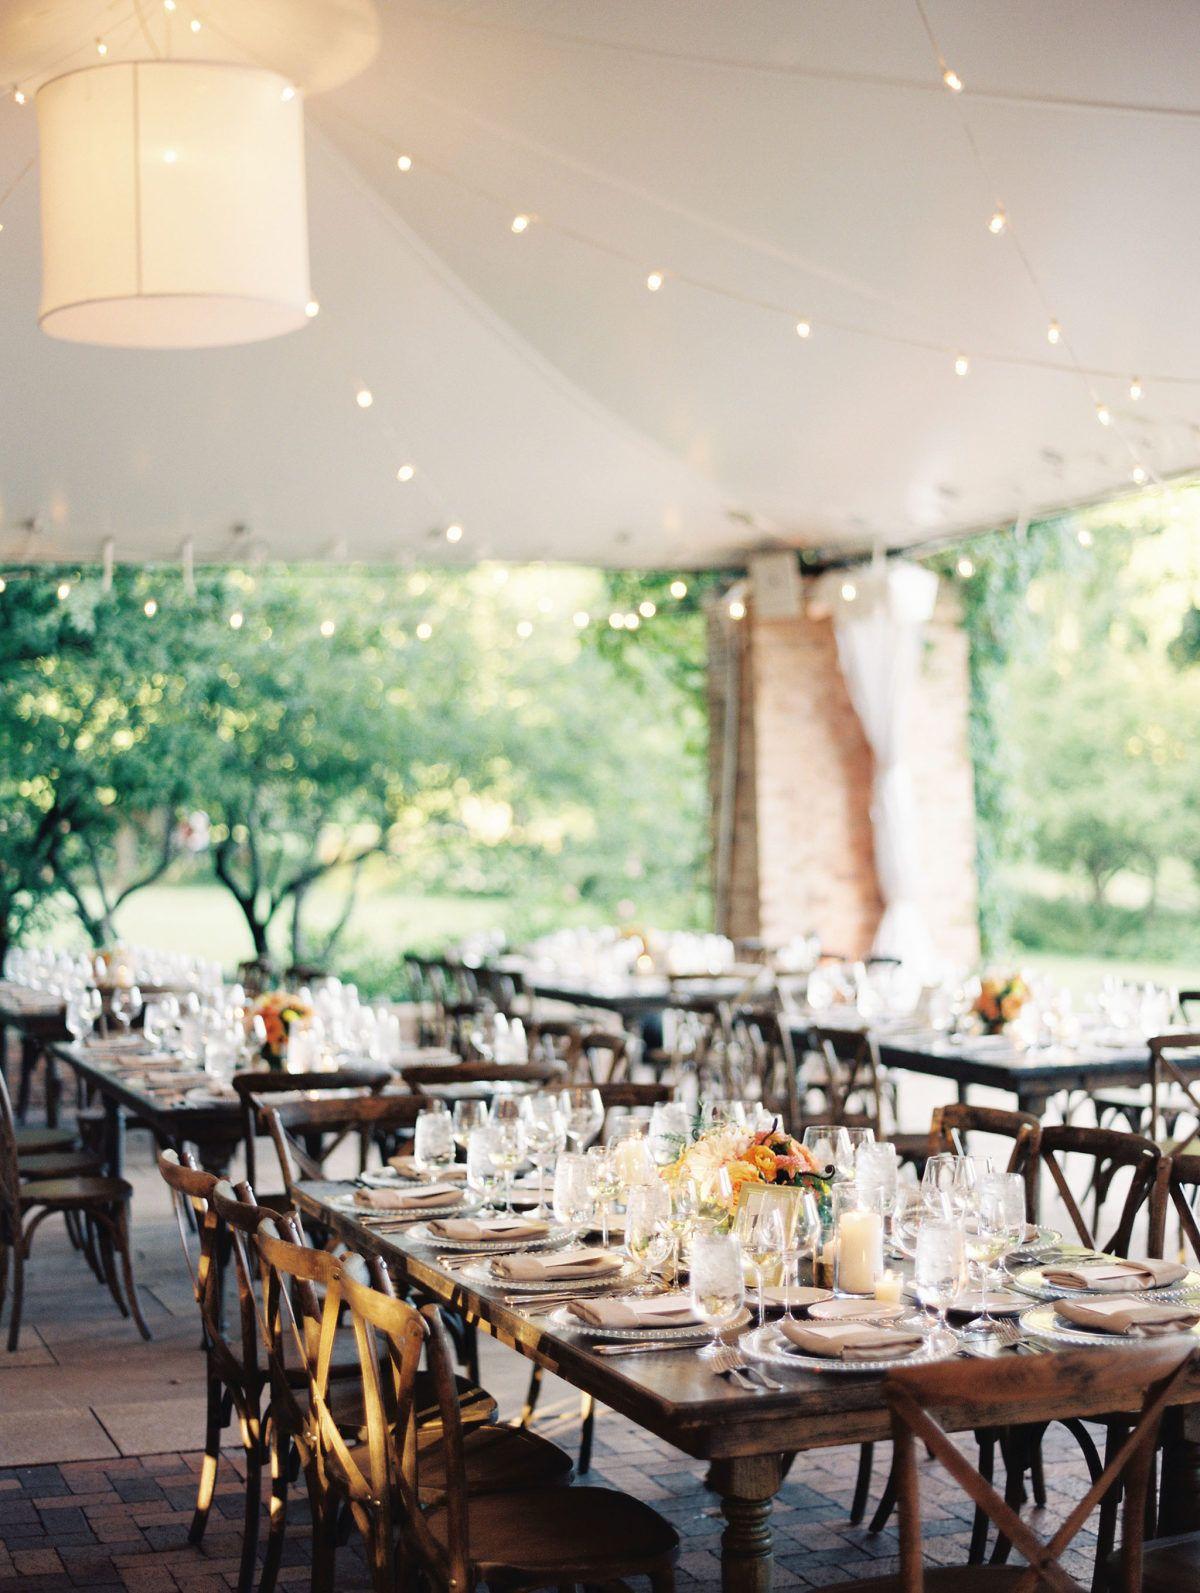 Charming Summertime Wedding at the Chicago Botanic Garden